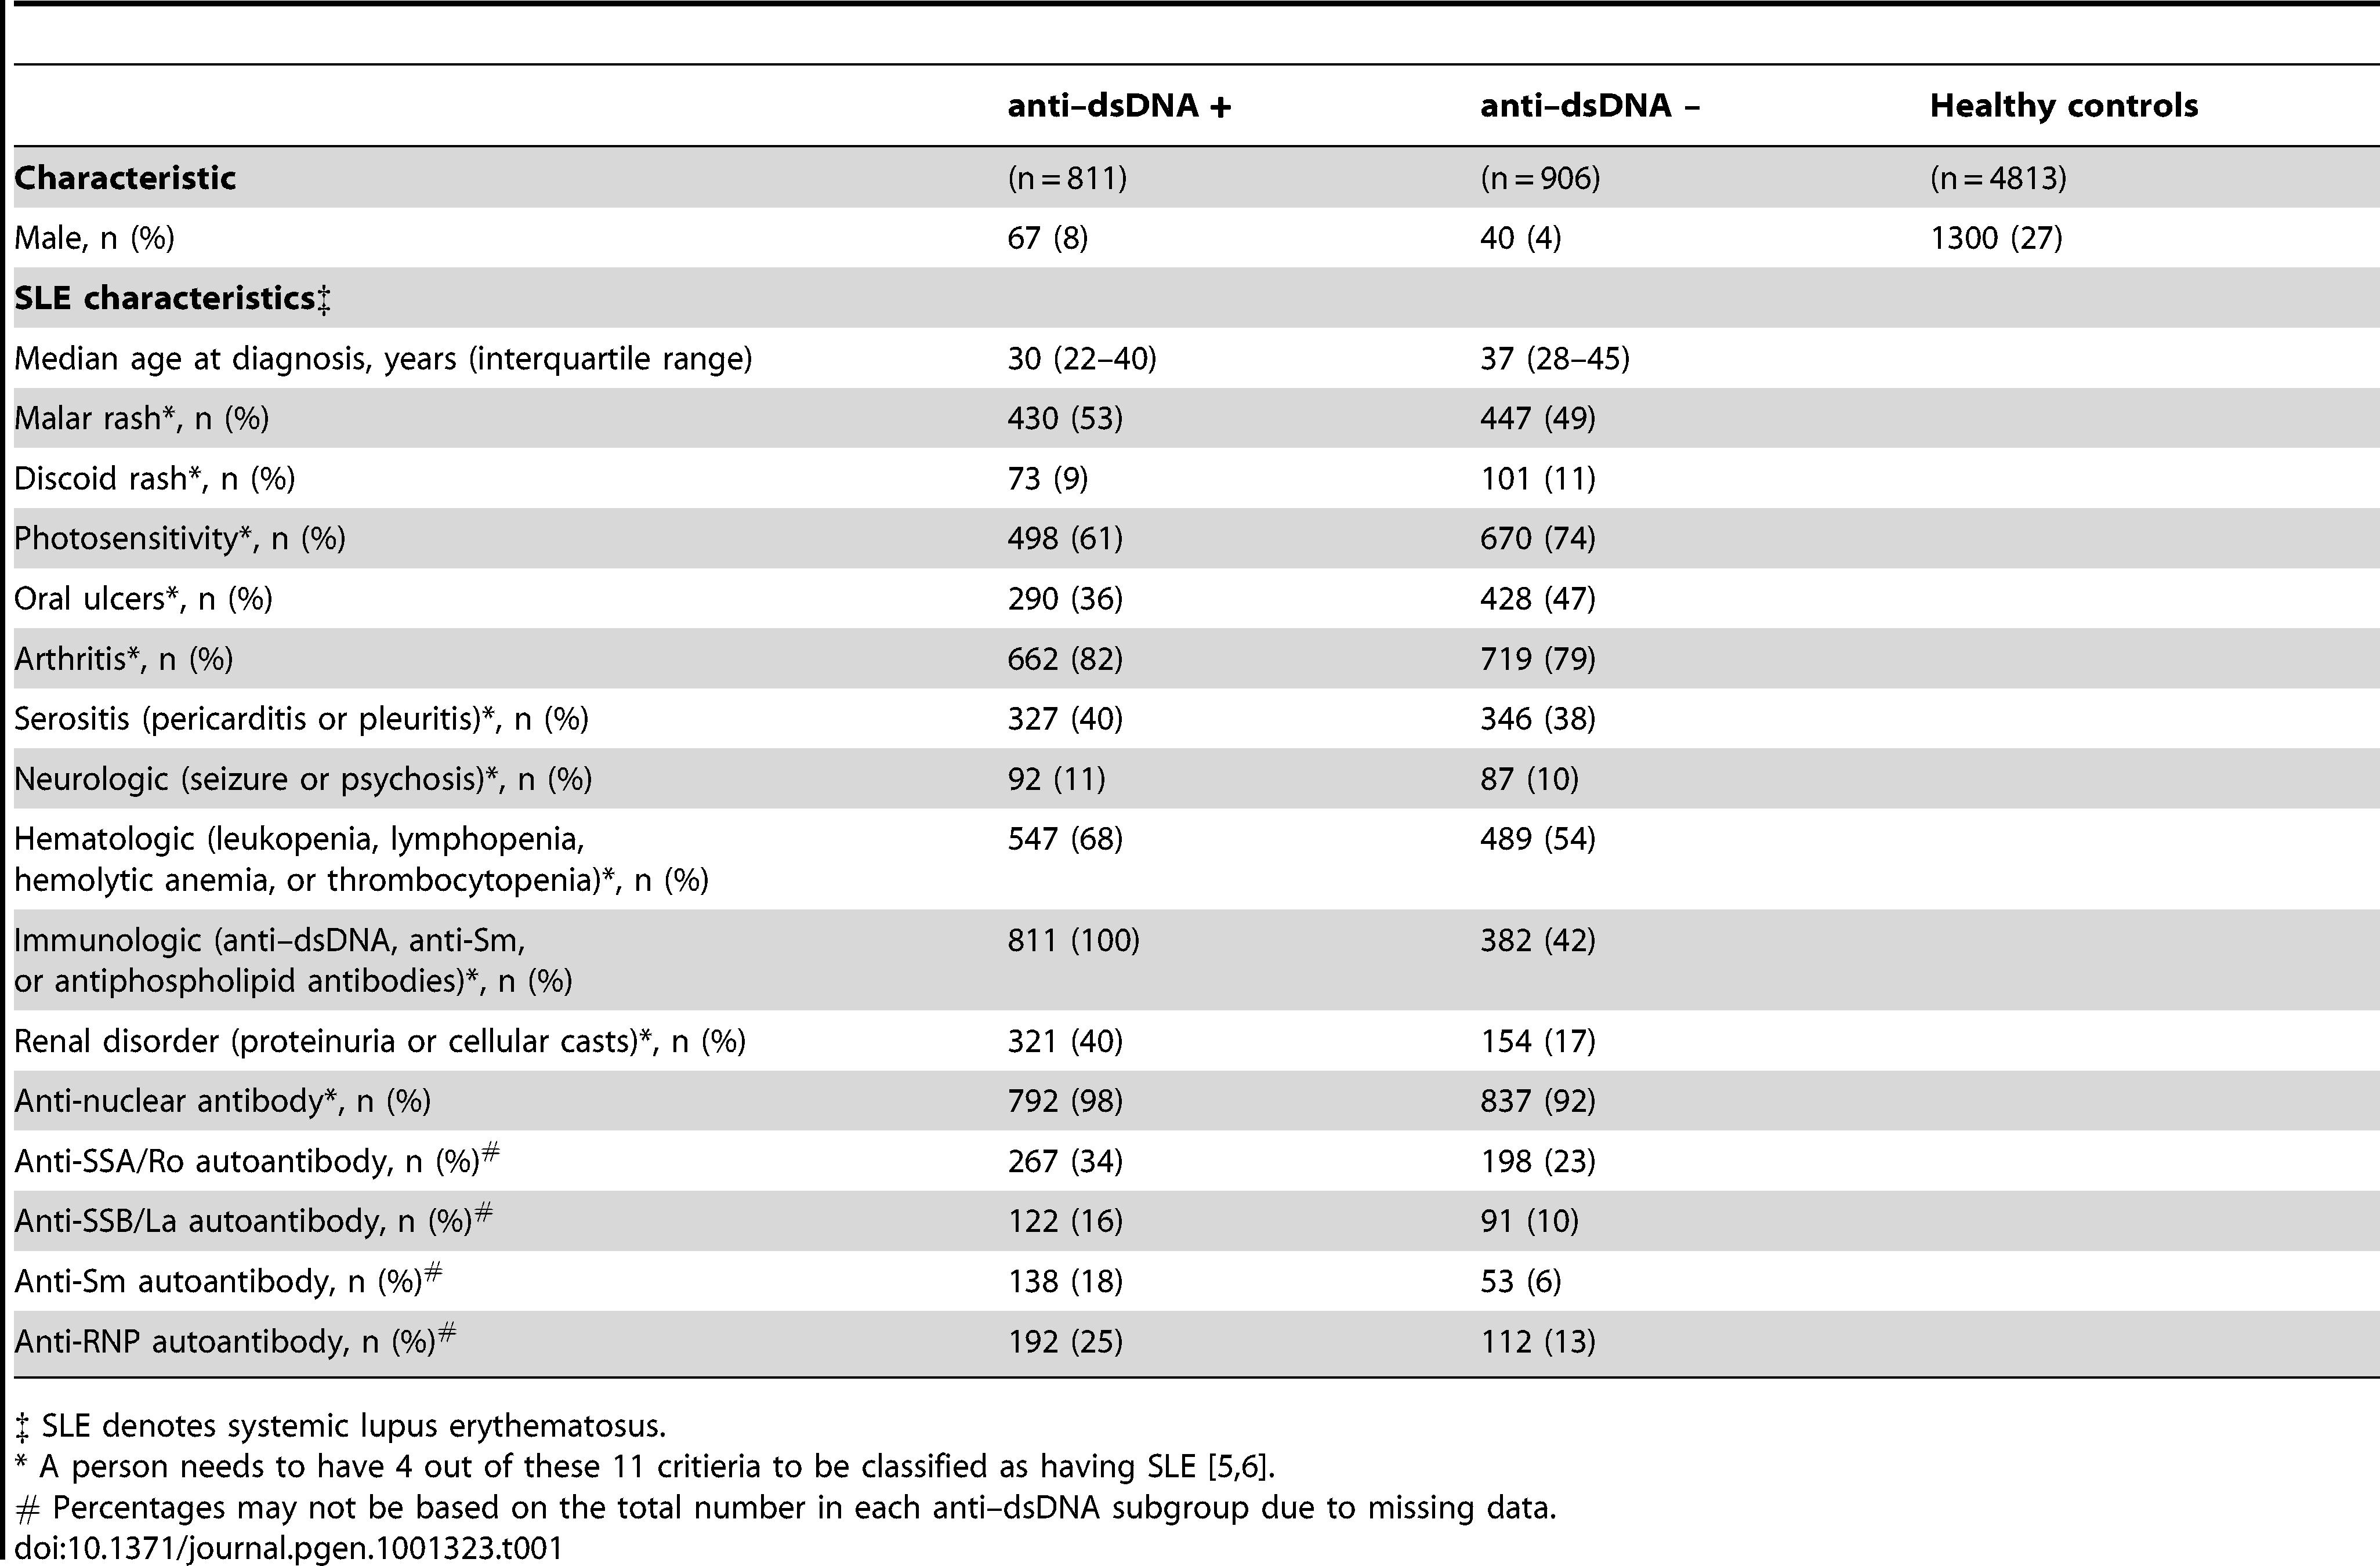 Characteristics of the study participants.